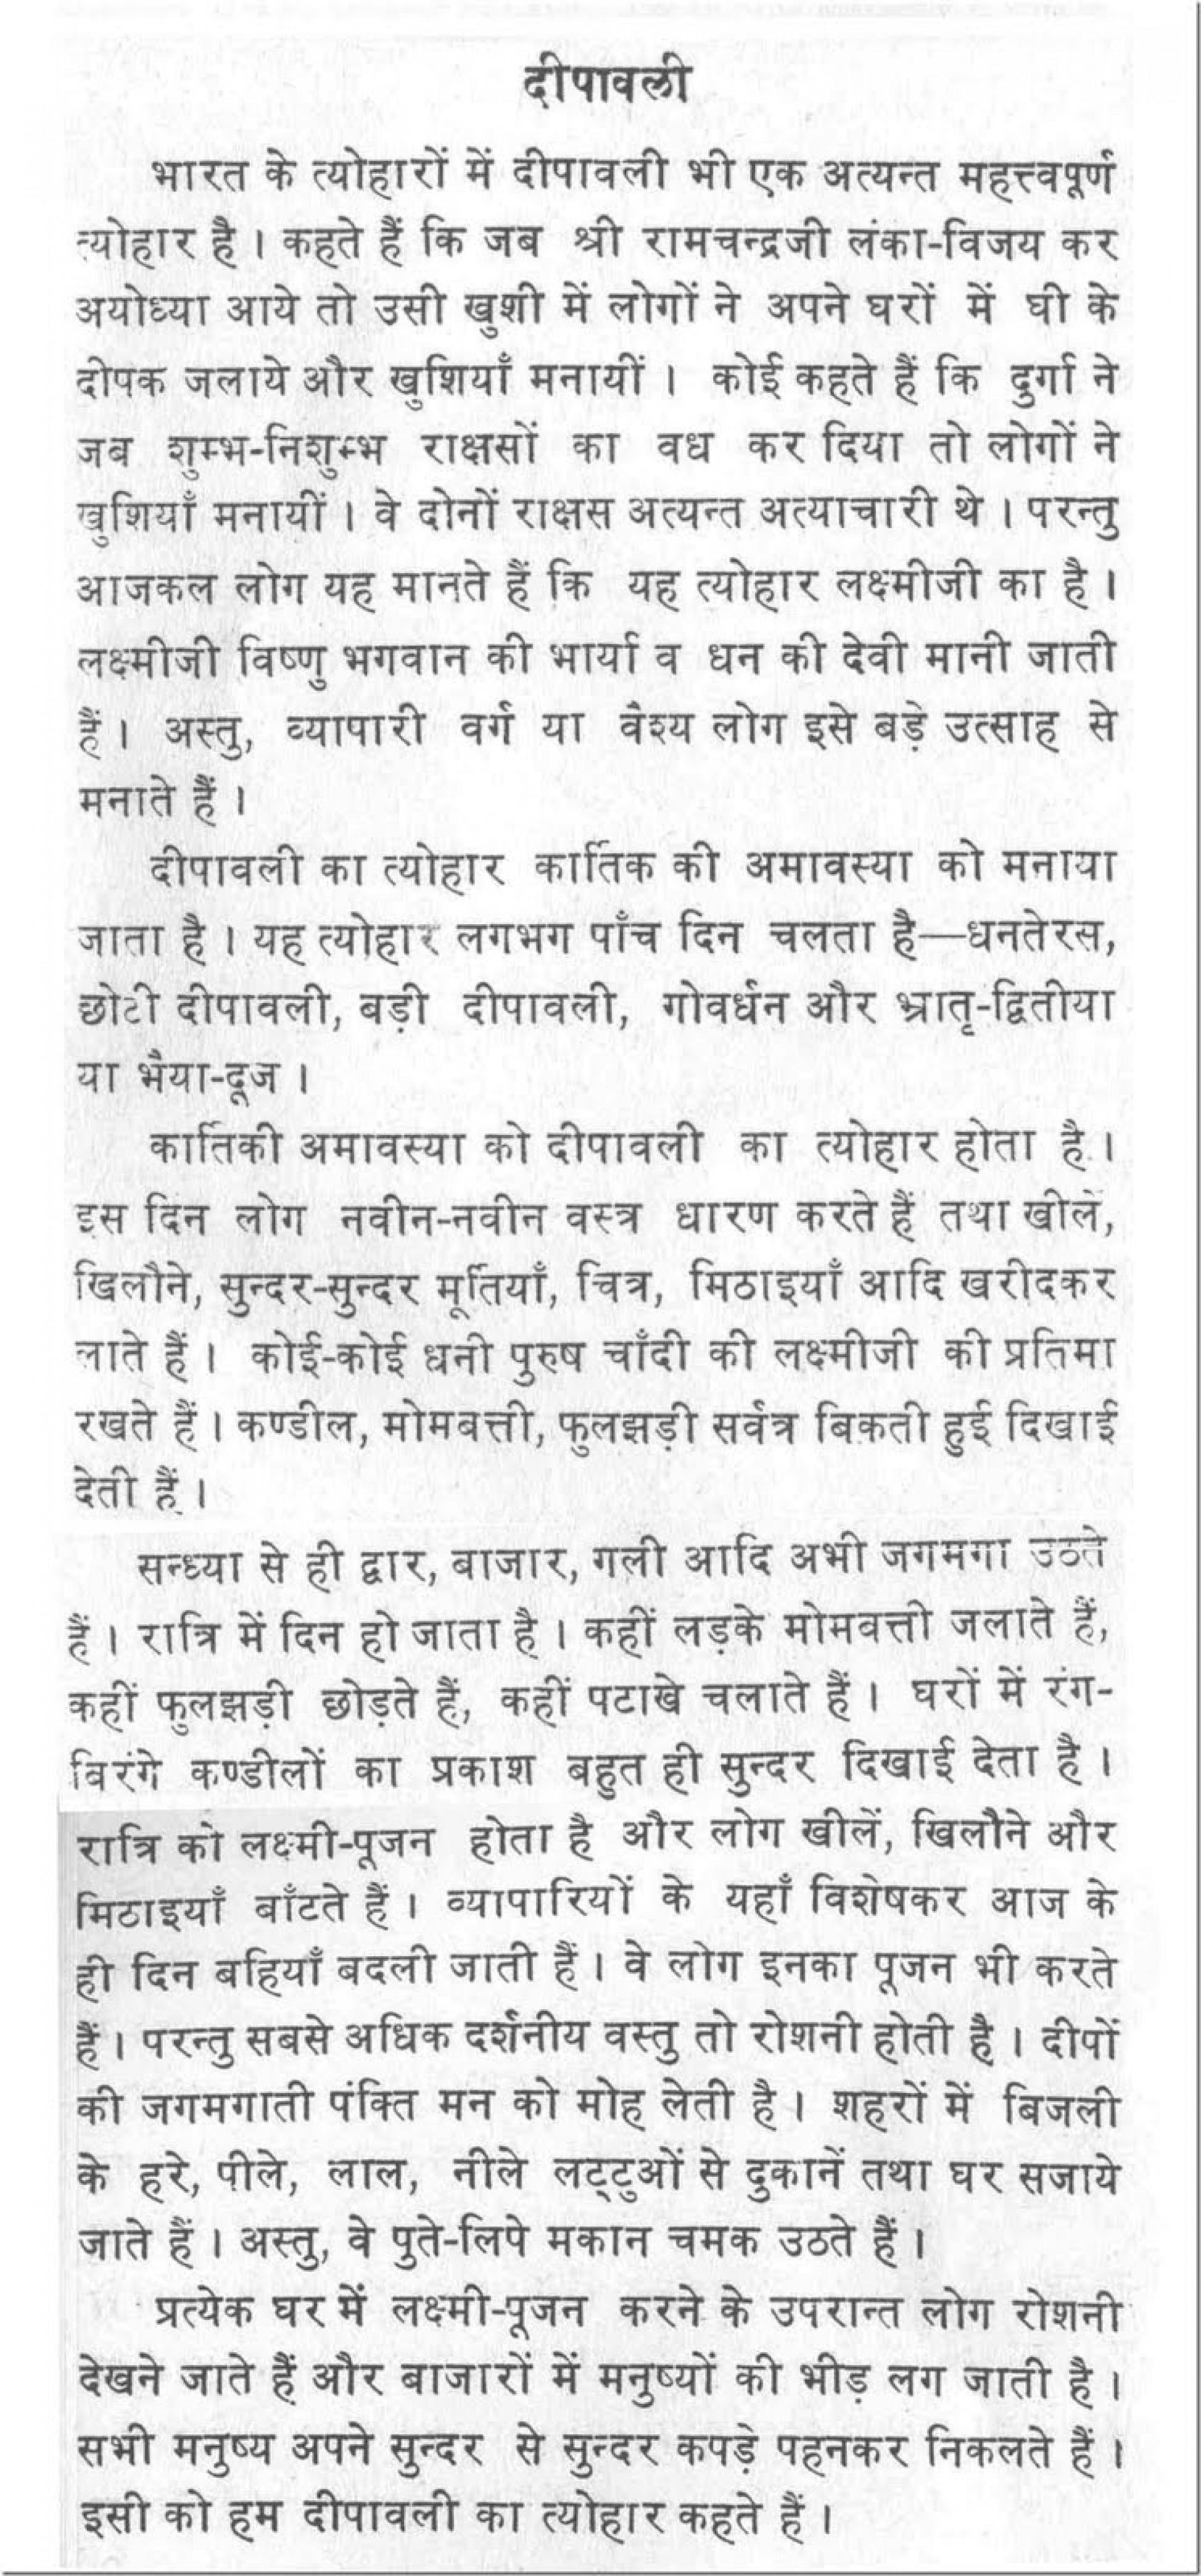 017 Essay Example Diwali20esay20in20hindi Hard Wonderful Work Pdf Pays Off In Hindi Writing 1920